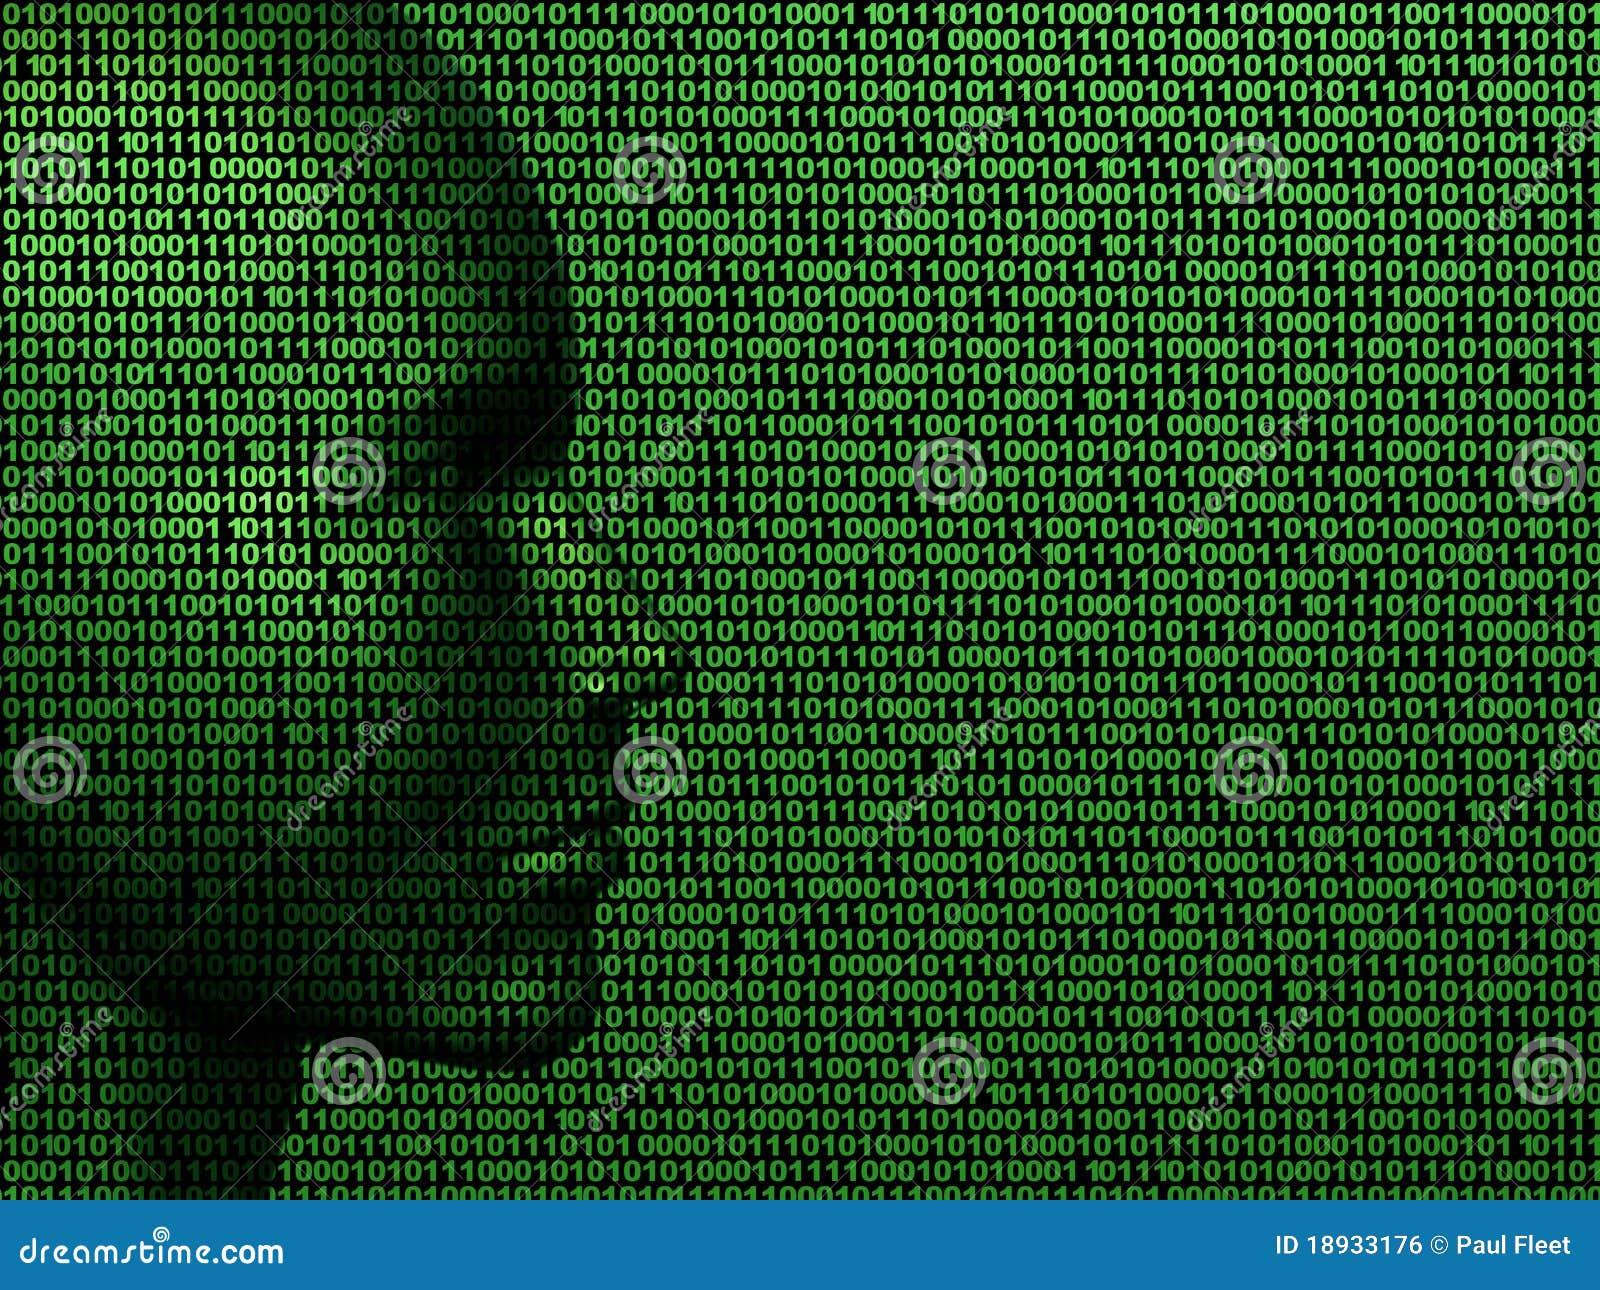 how to read machine code